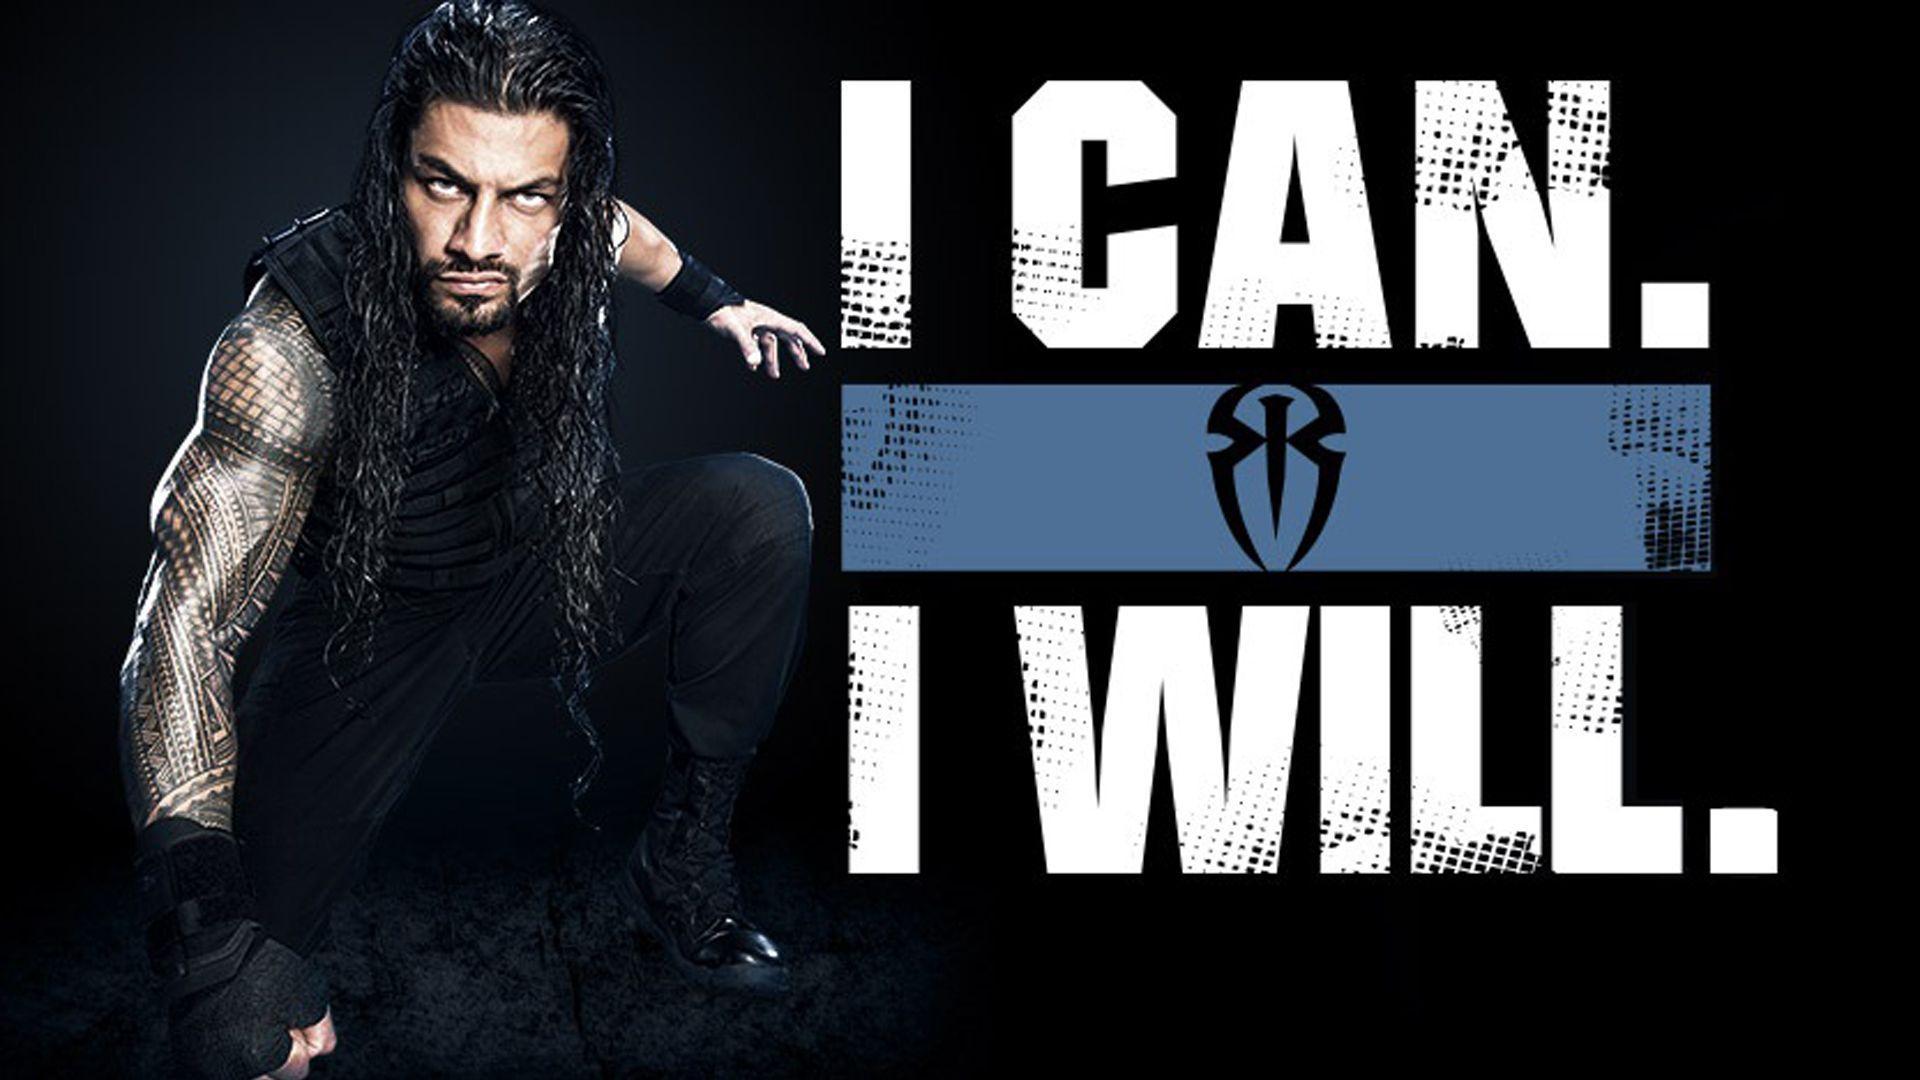 WWE Wallpapers HD 2017 - Wallpaper Cave